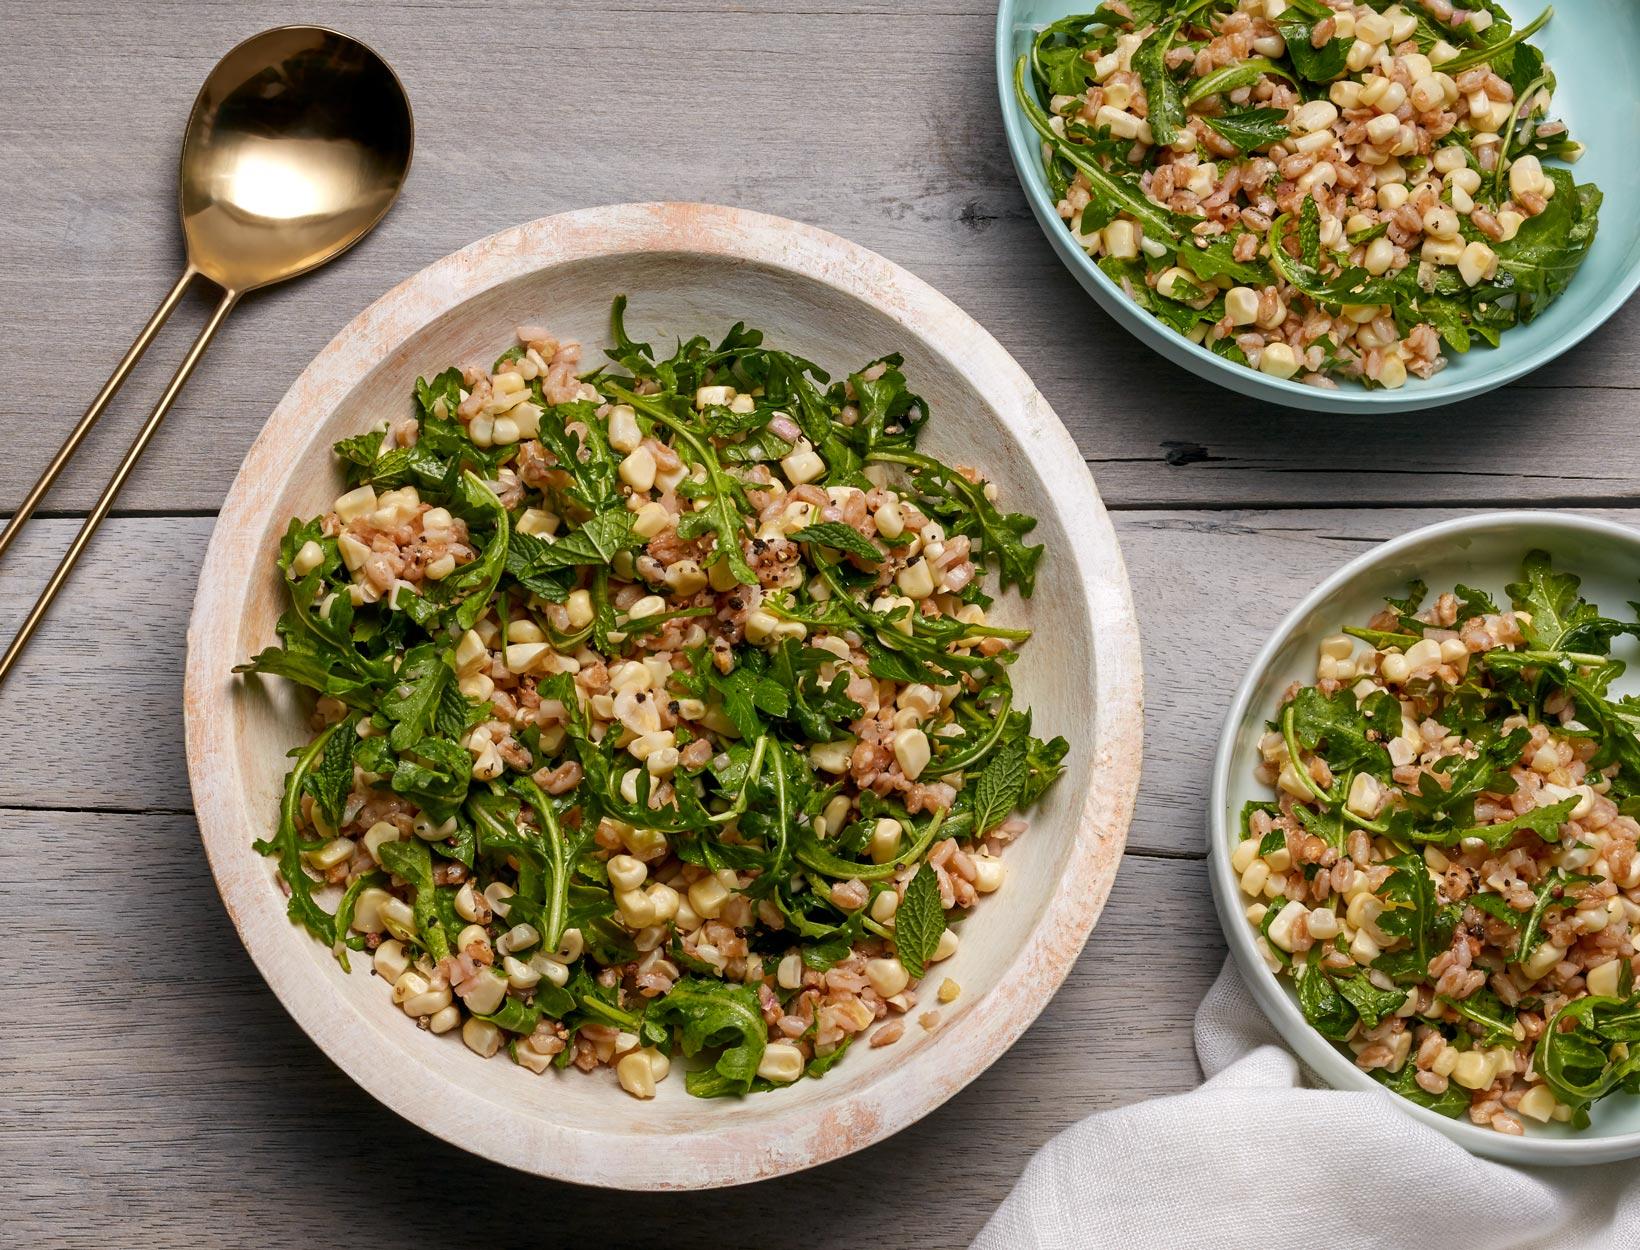 Farro Salad with Corn, Arugula, and Fresh Herbs